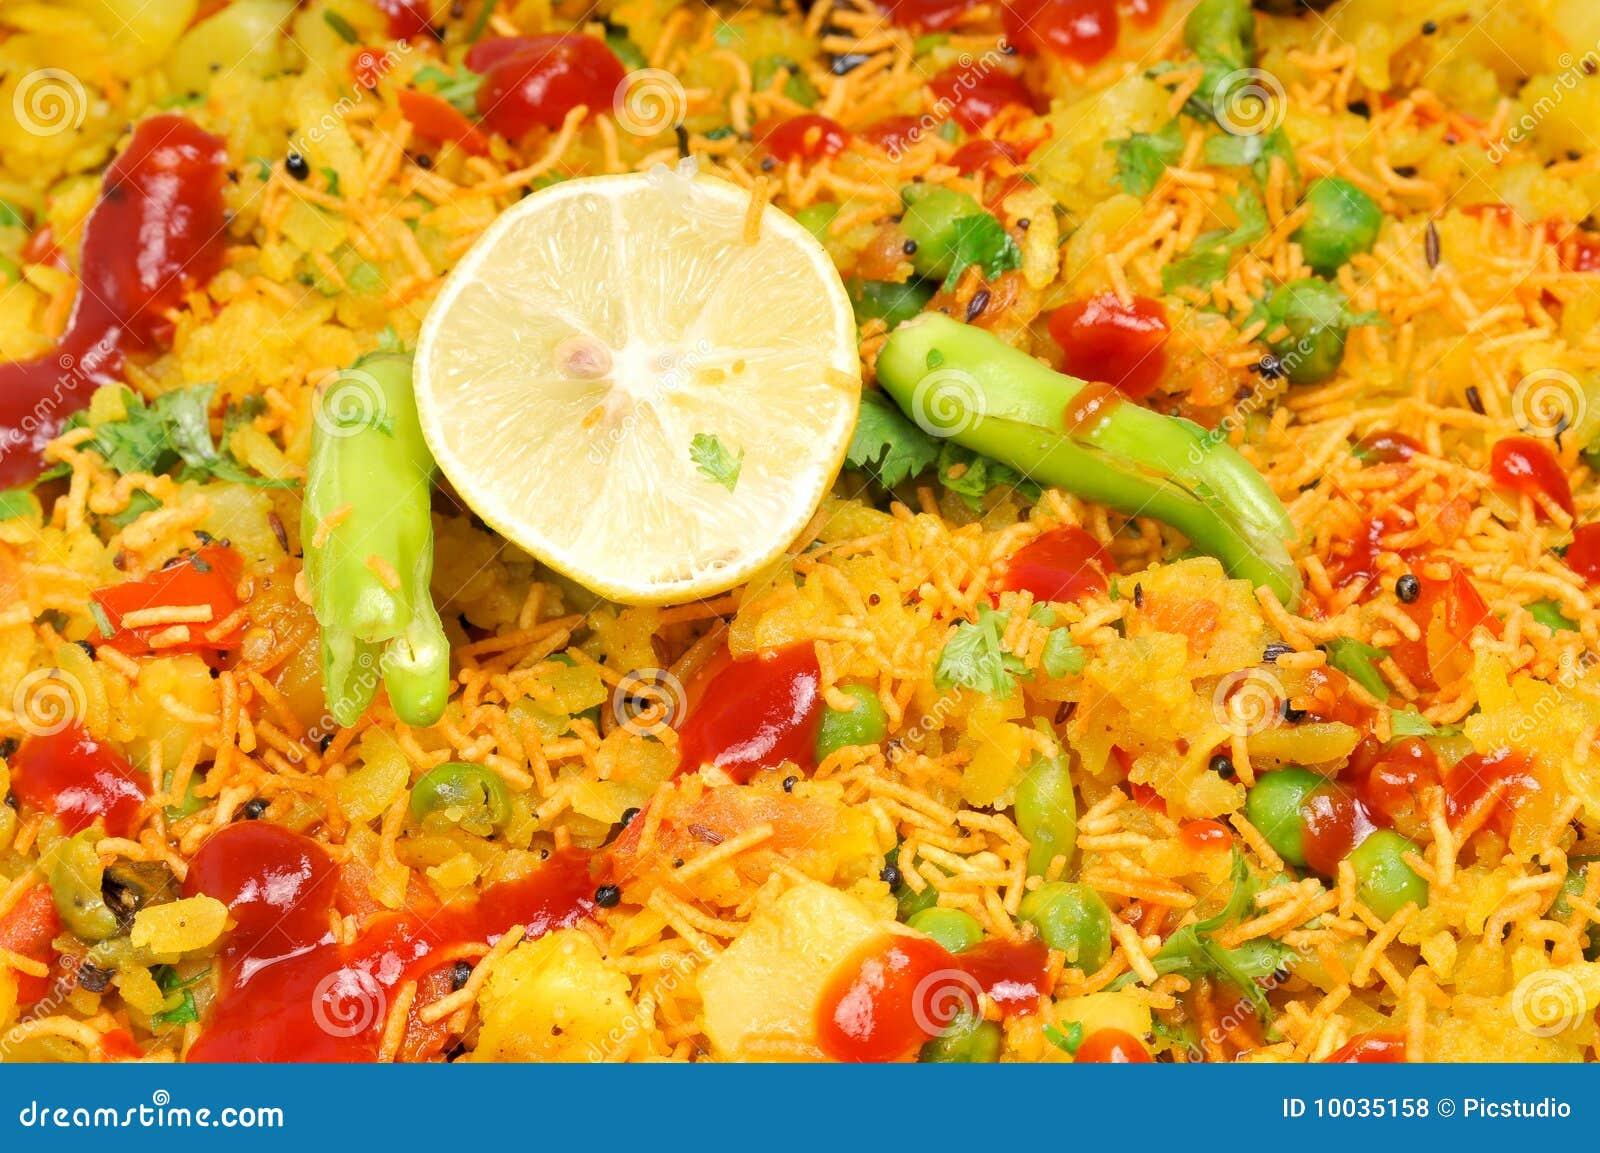 Veg Gujarati Poha Dish Royalty Free Stock Photos - Image: 10035158